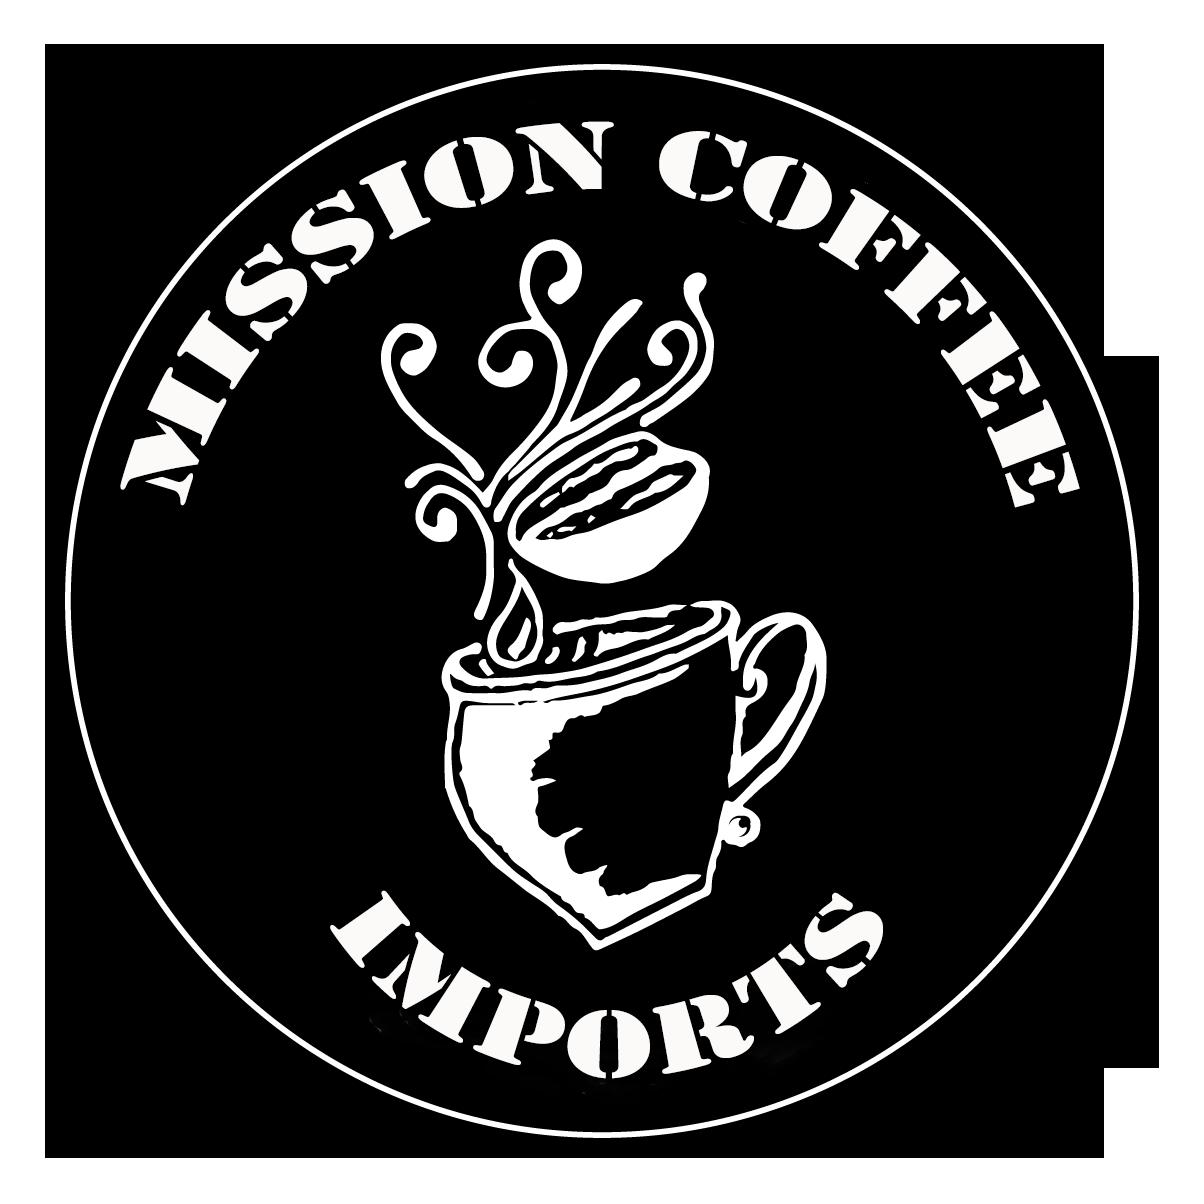 Mission Coffee Imports LLC